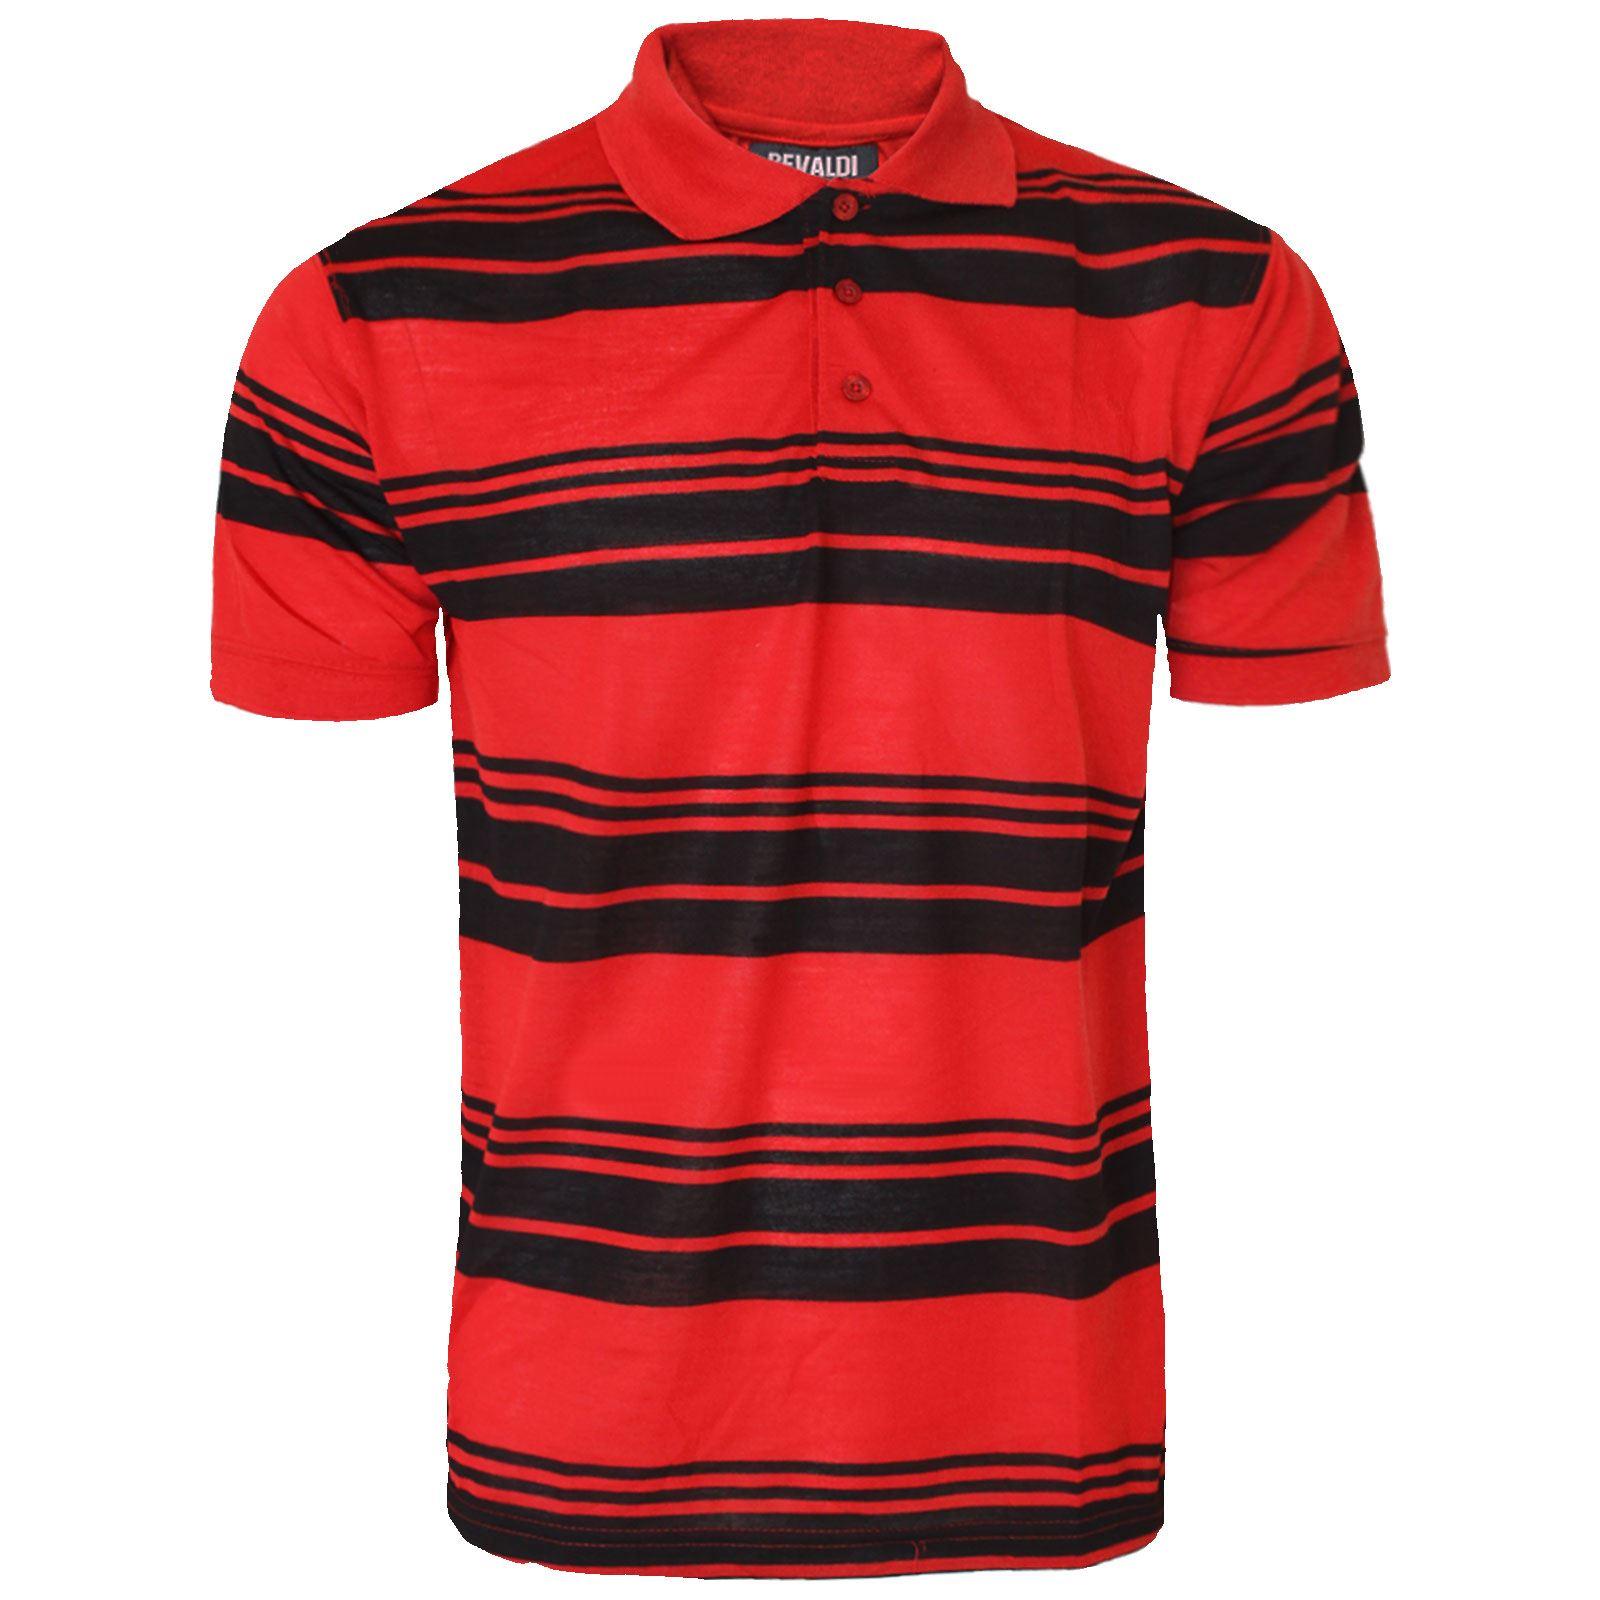 Mens Striped Short Sleeve Polo Shirt Top Golf T Shirt